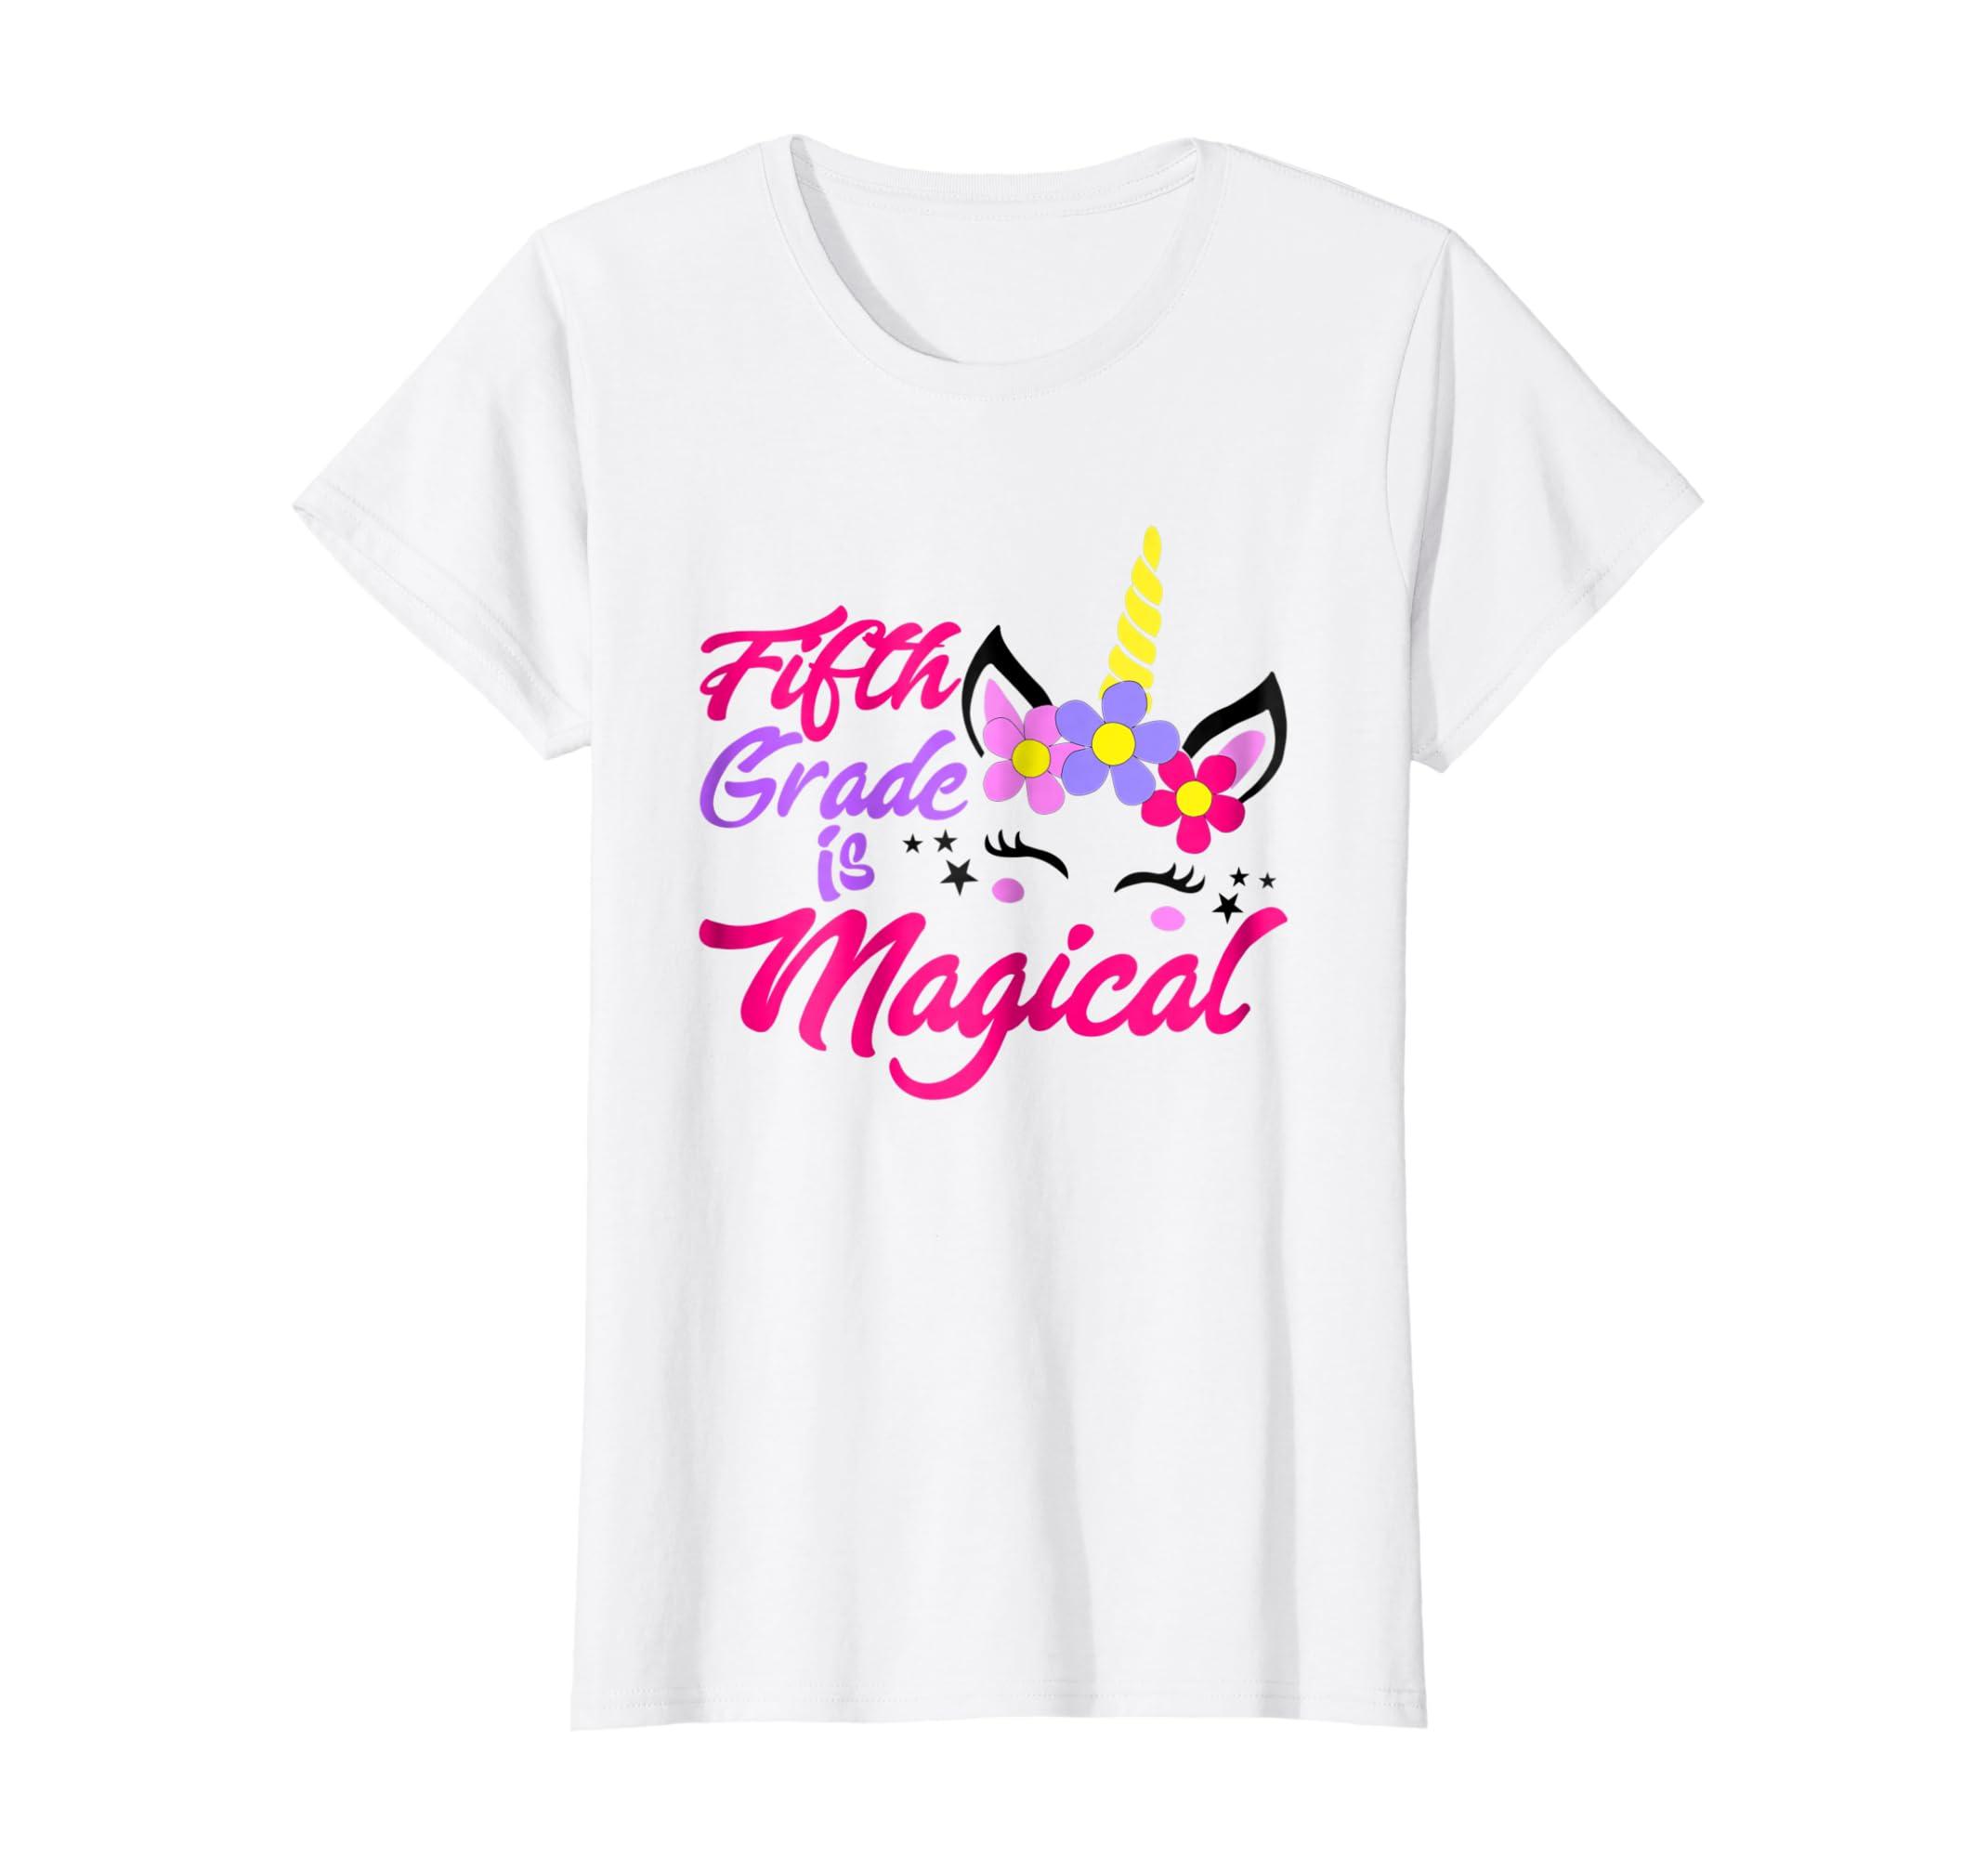 Amazon Team 5th Grade Teacher Funny Cute TShirt Back To School Gift Clothing